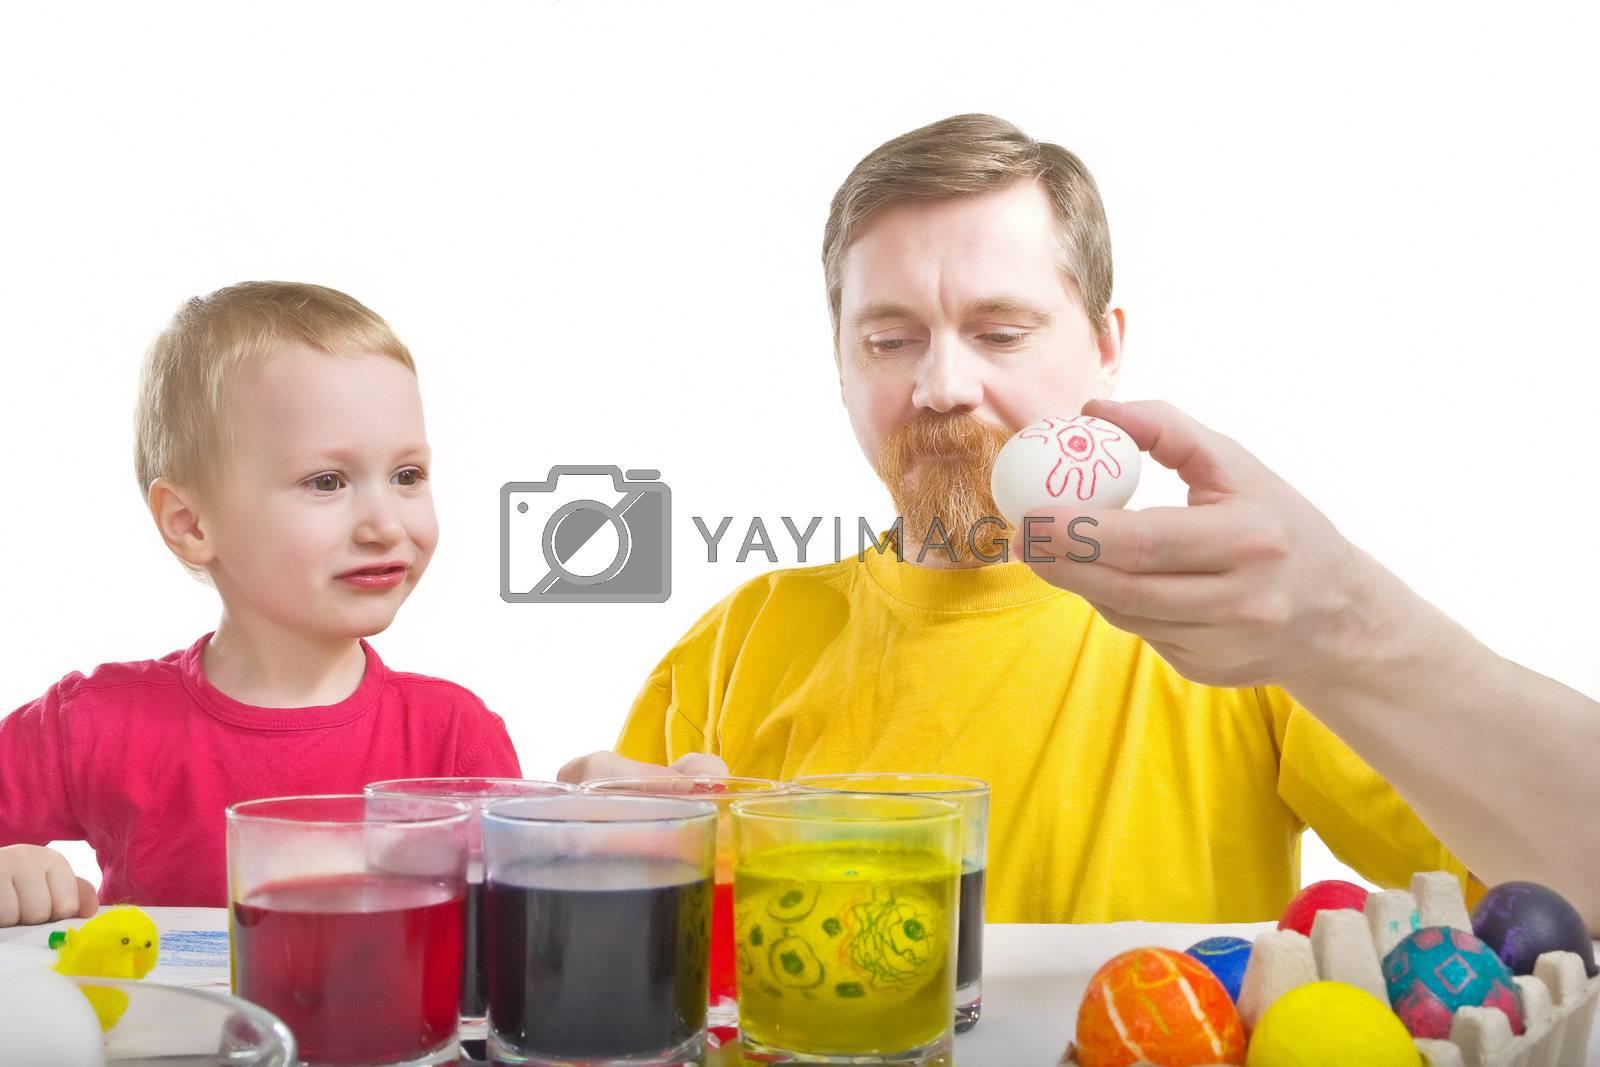 We do Easter eggs by vidrik